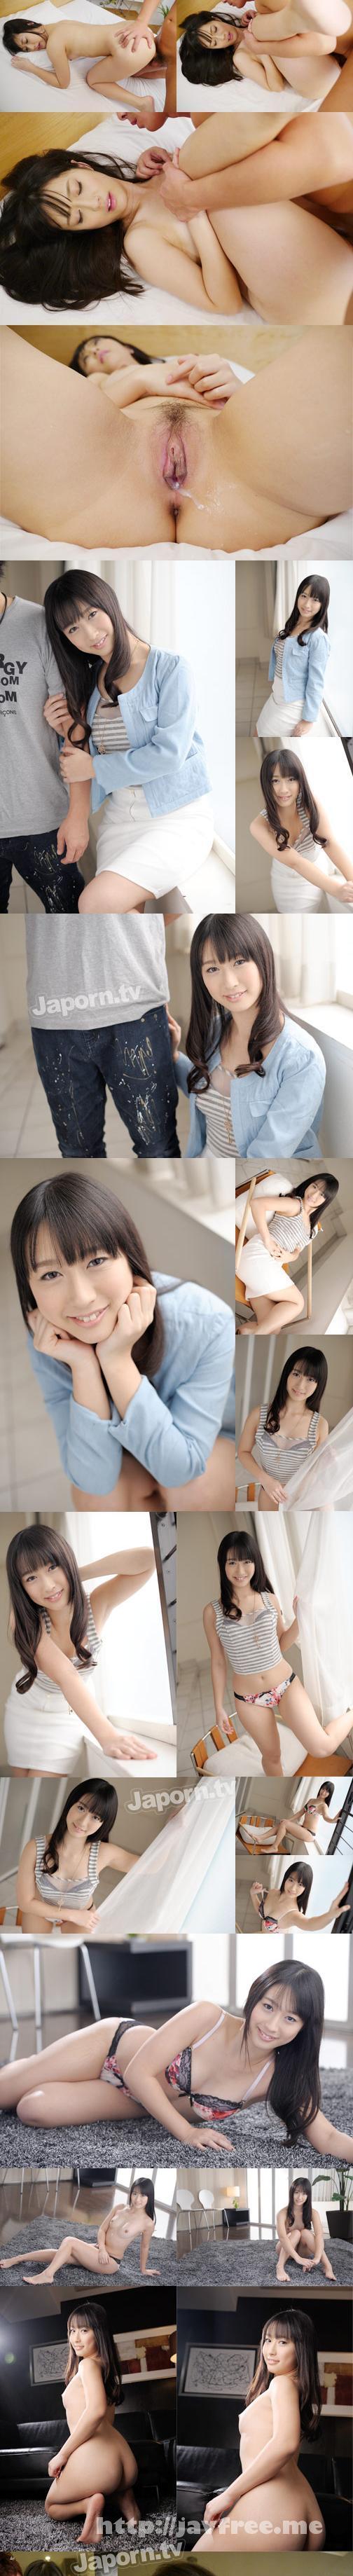 [DSAMD 05] 親友の彼女 : 本澤朋美 本澤朋美 Tomomi Motozawa DSAMD